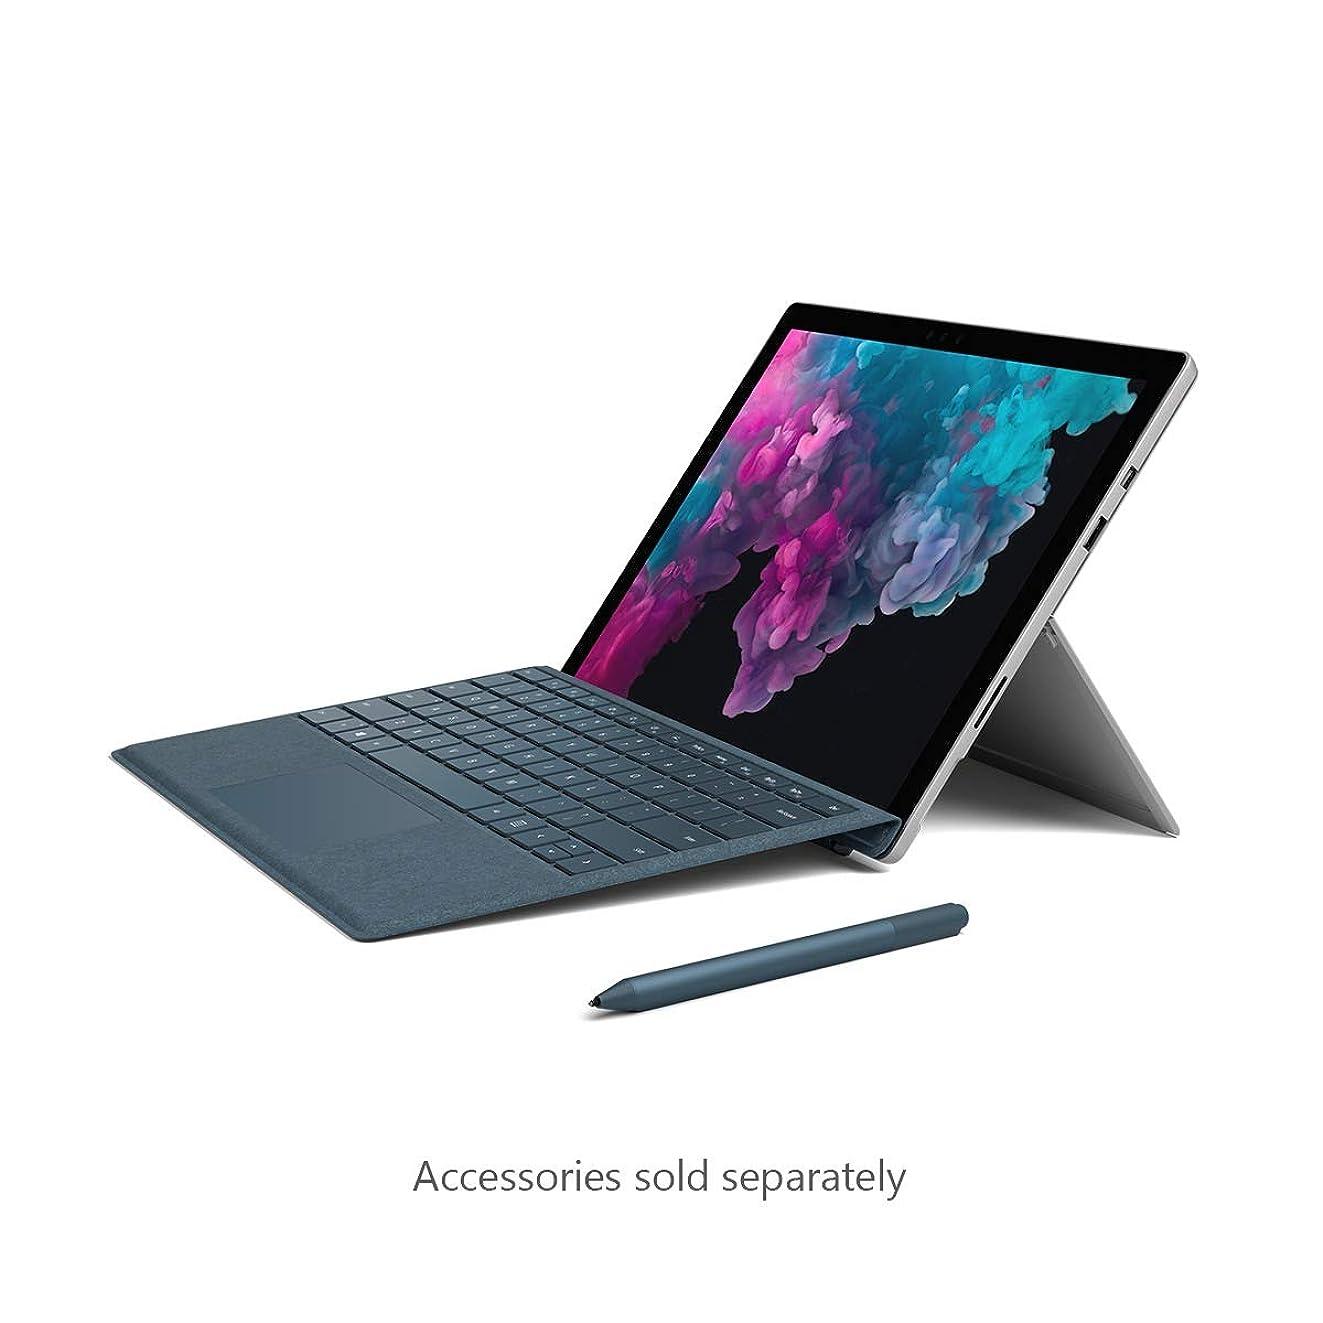 Microsoft Surface Pro 6 (Intel Core i5, 8GB RAM, 128GB) - Newest Version, Platinum